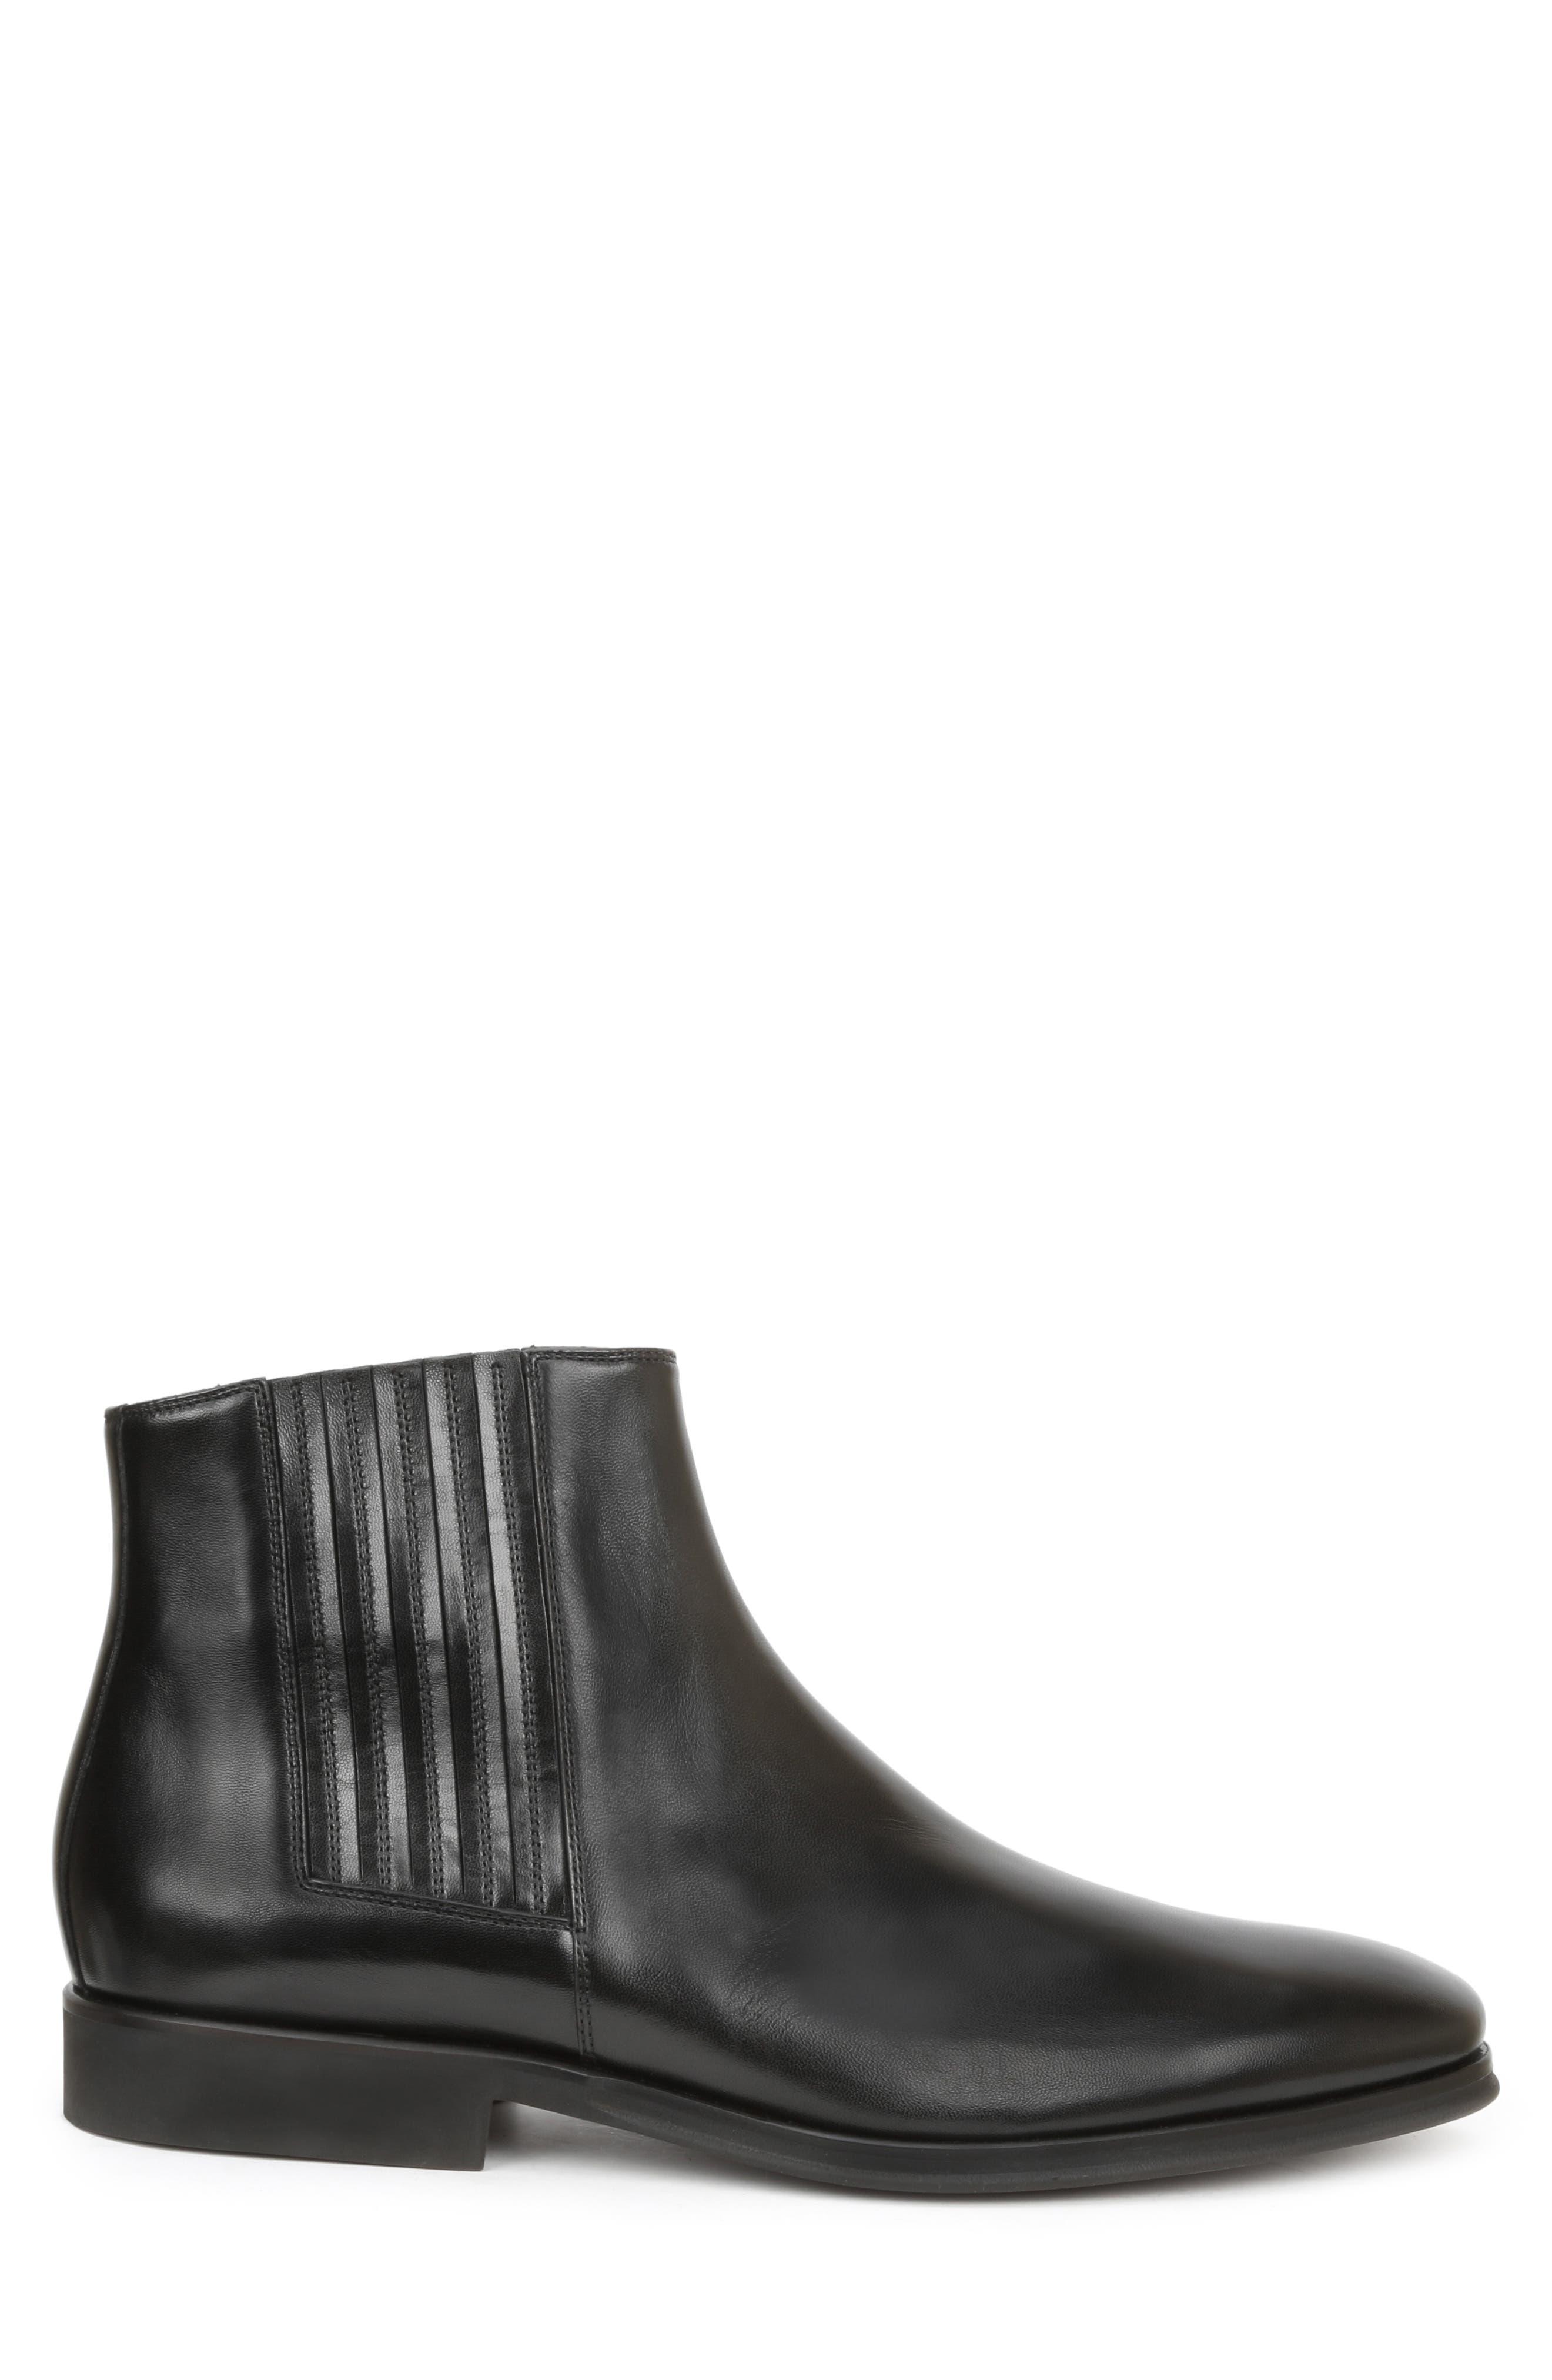 Rezzo Chelsea Boot,                             Alternate thumbnail 3, color,                             BLACK